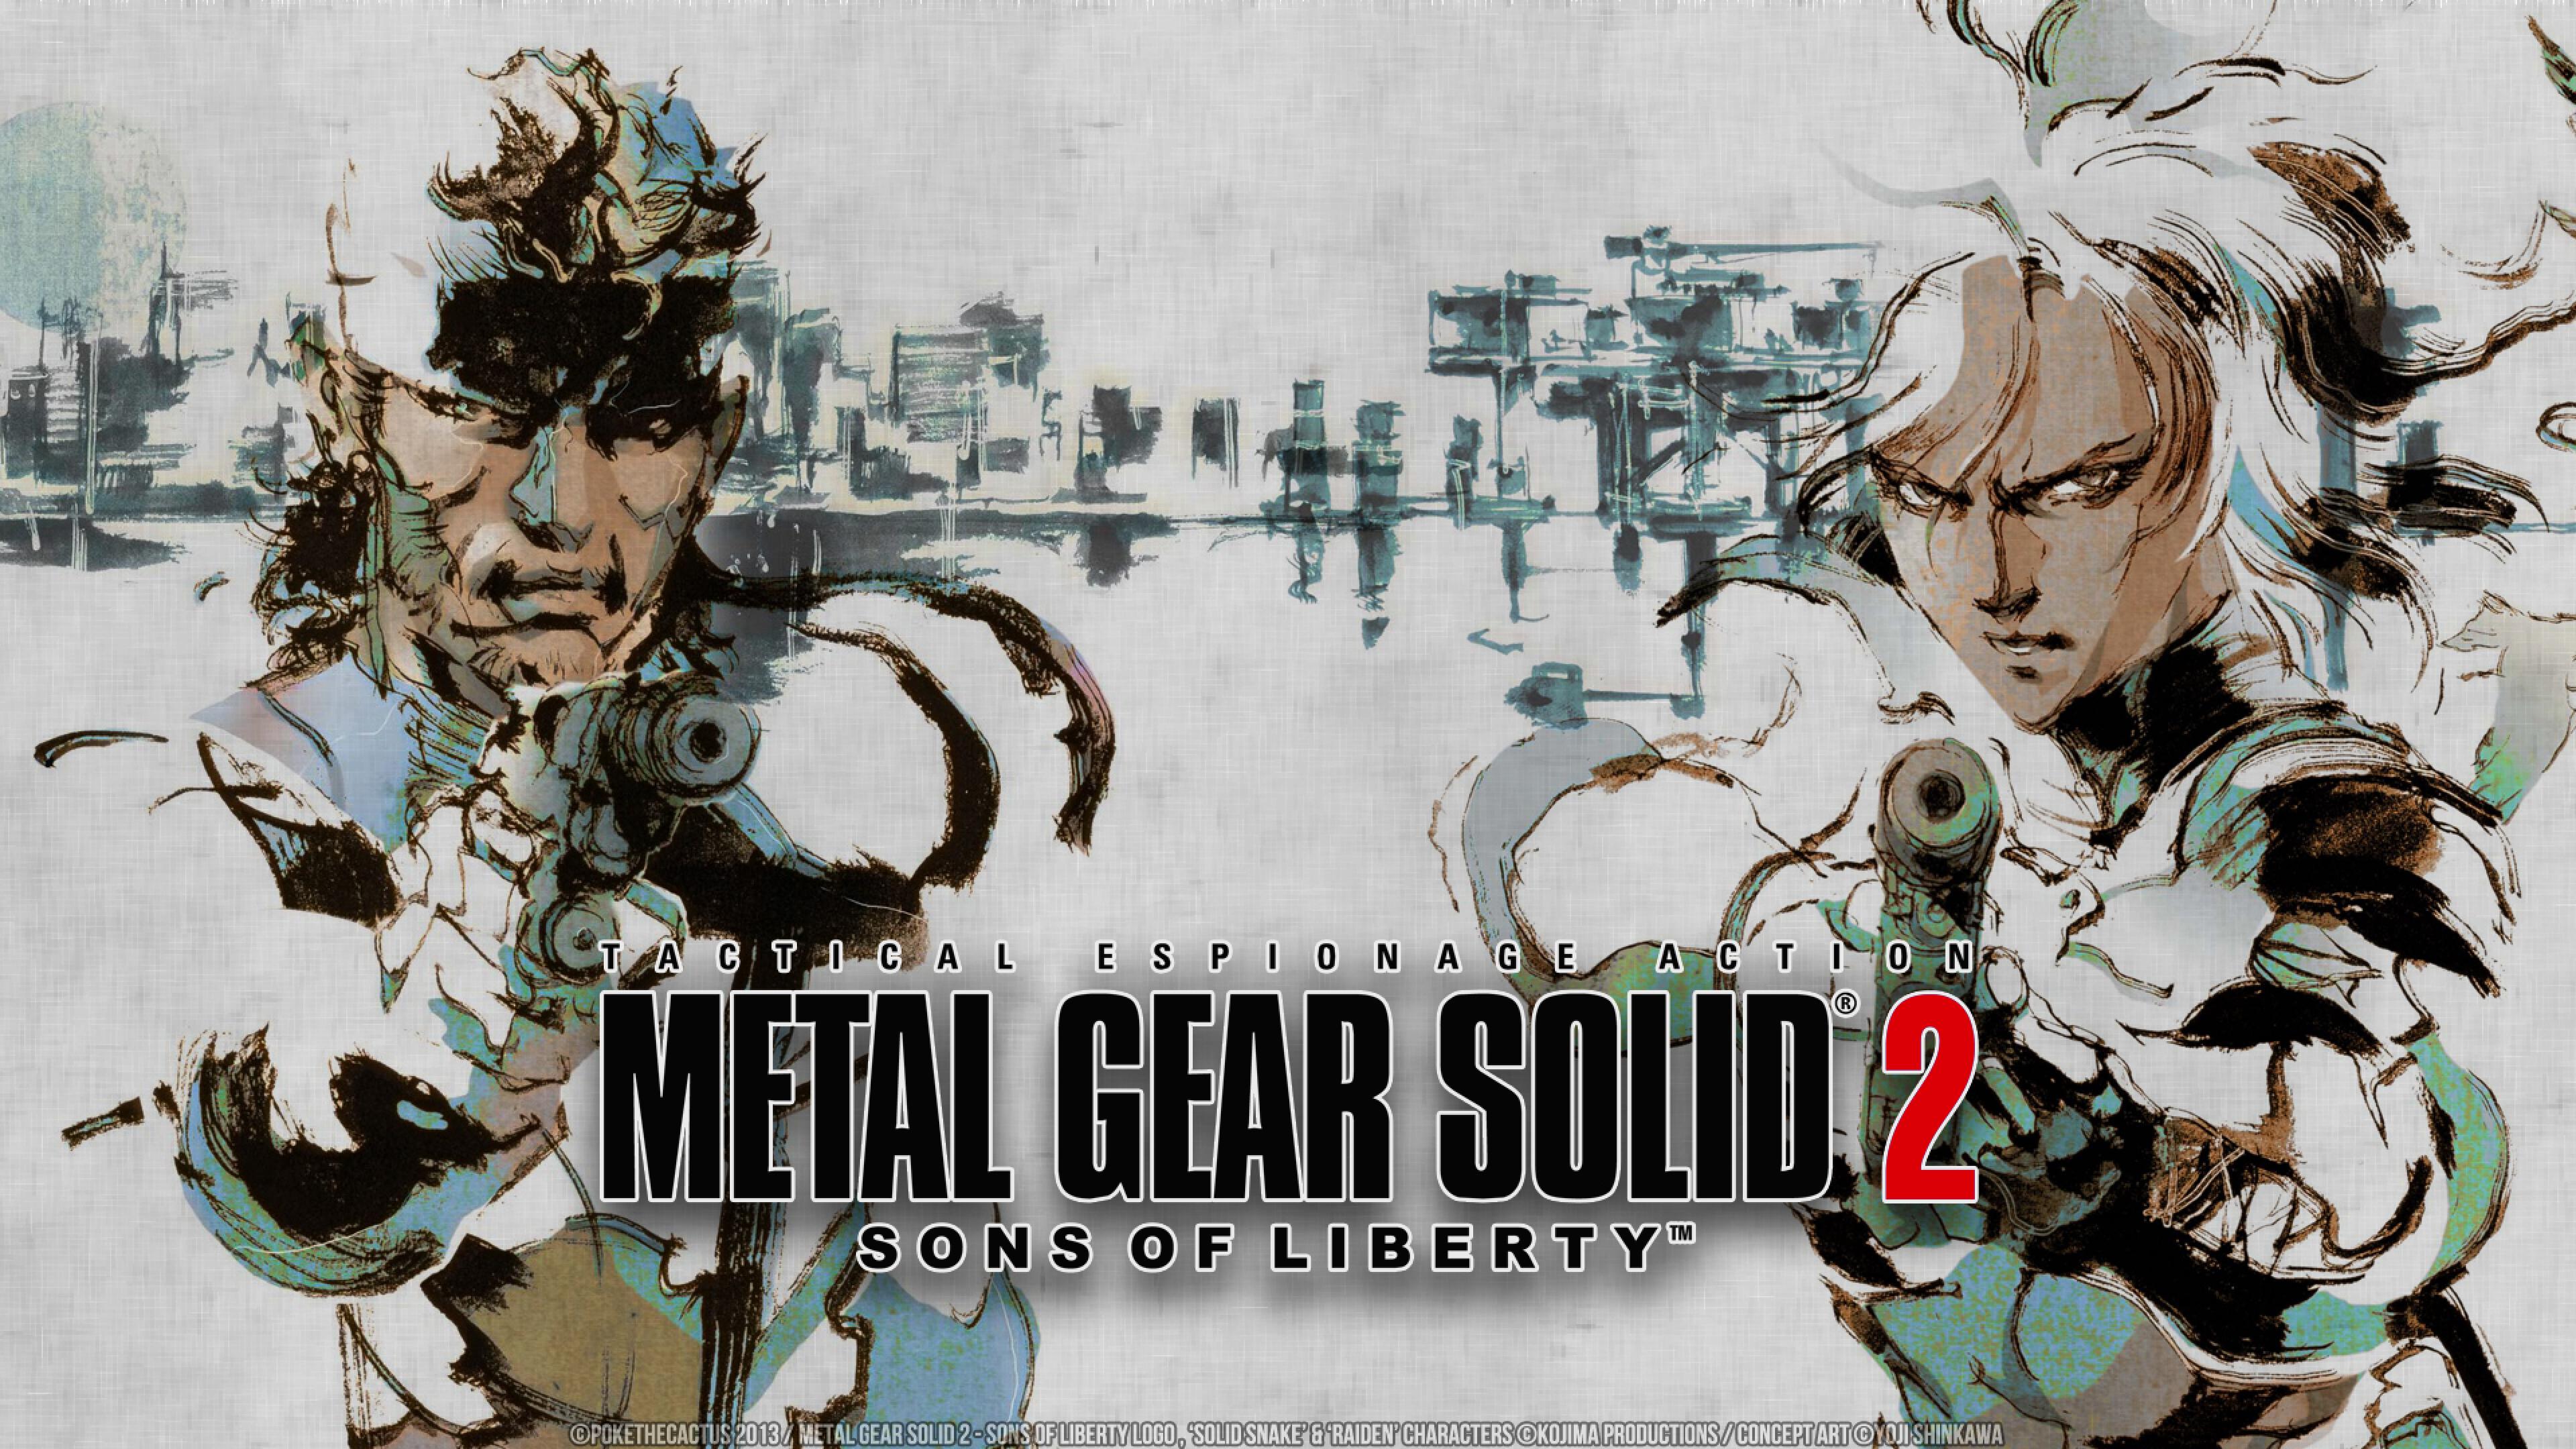 3840x2160 Metal Gear Solid 2 Sons Of Liberty 4k Wallpaper Hd